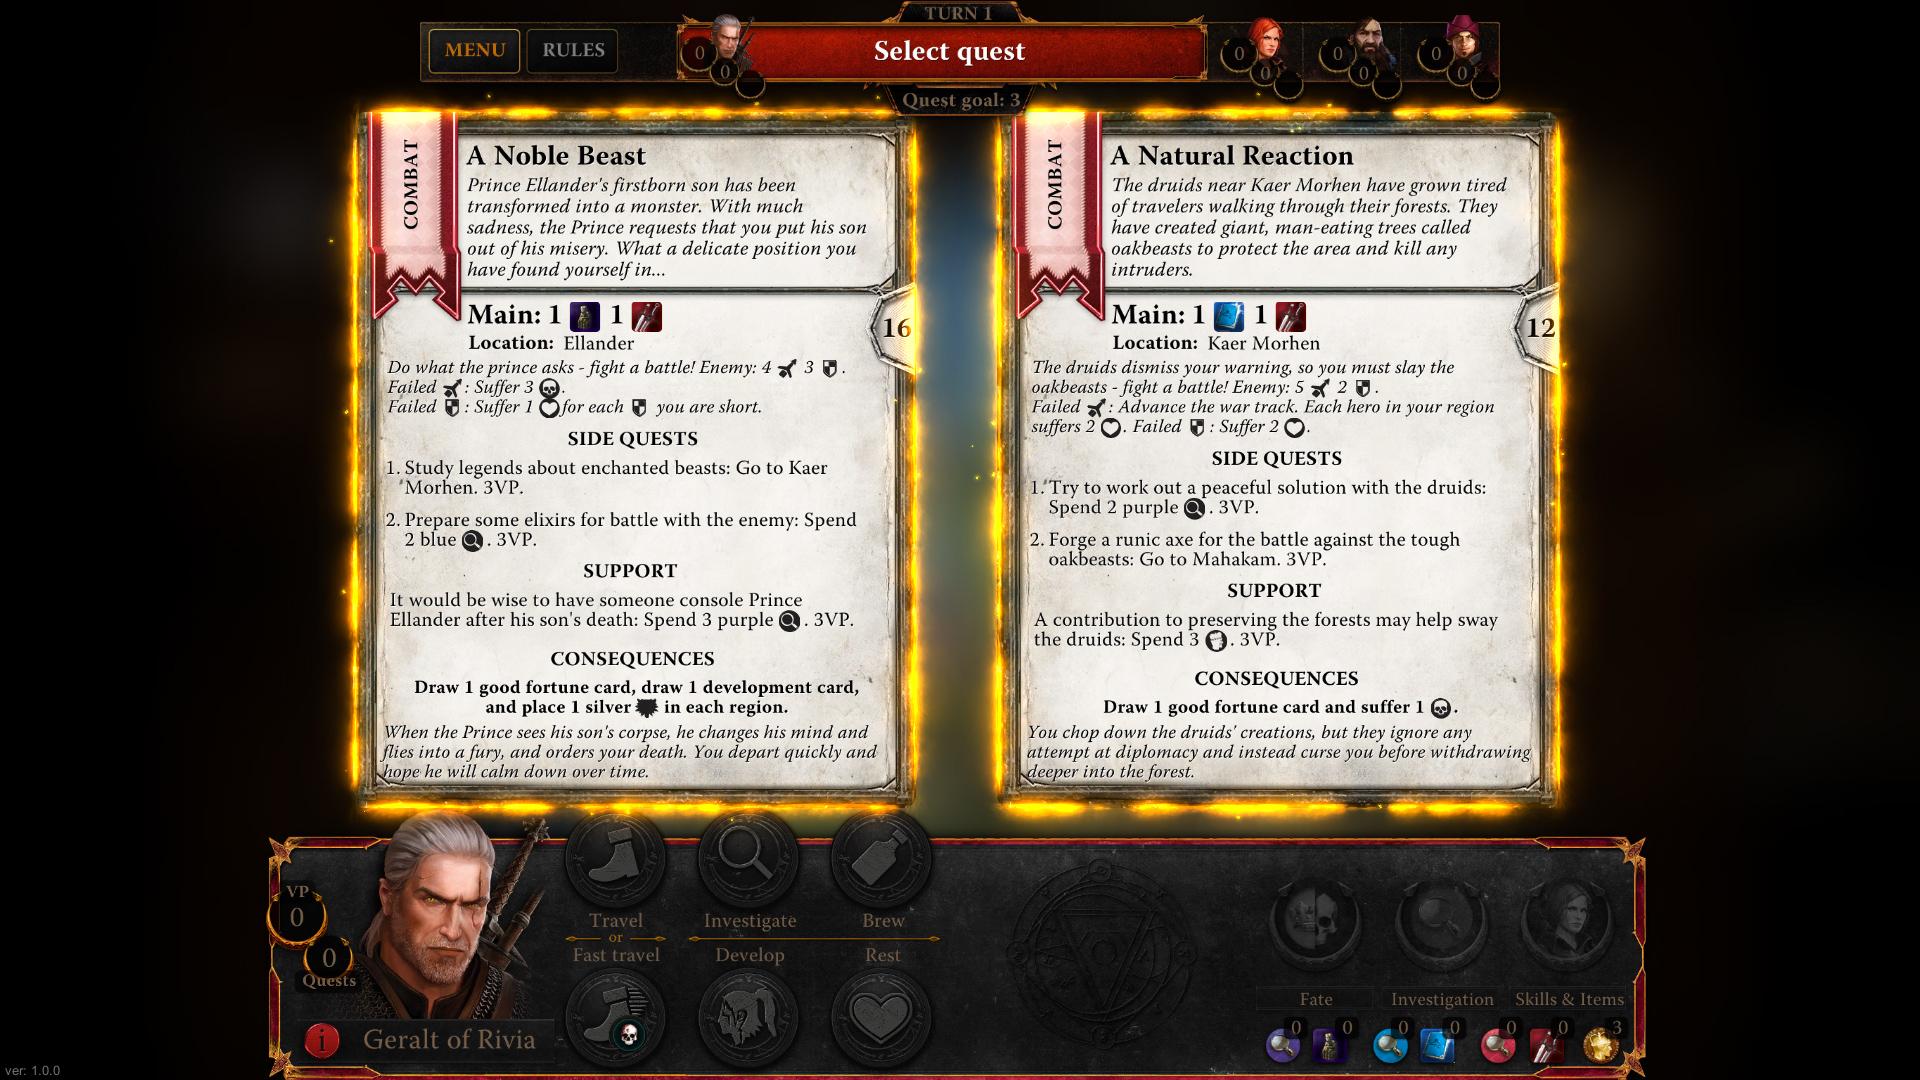 witcher_adventure_game_screenshot_gog_02